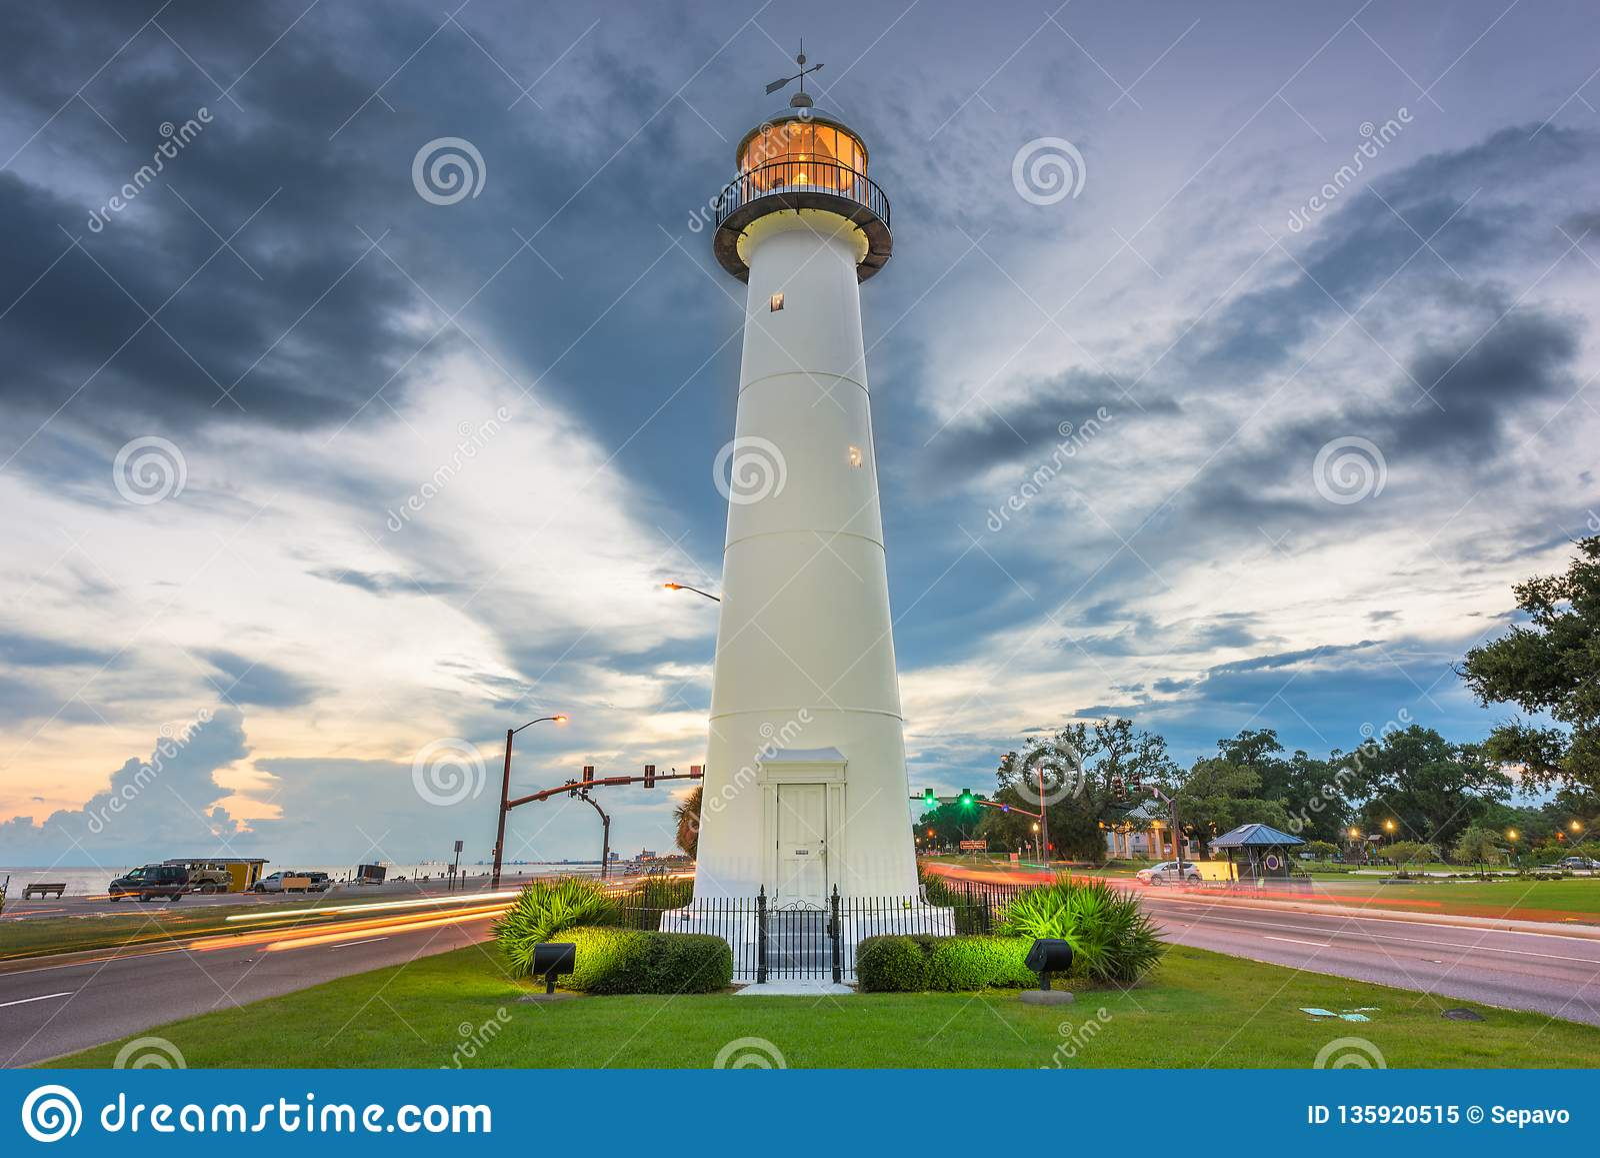 Biloxi, Mississippi USA at Biloxi Lighthouse